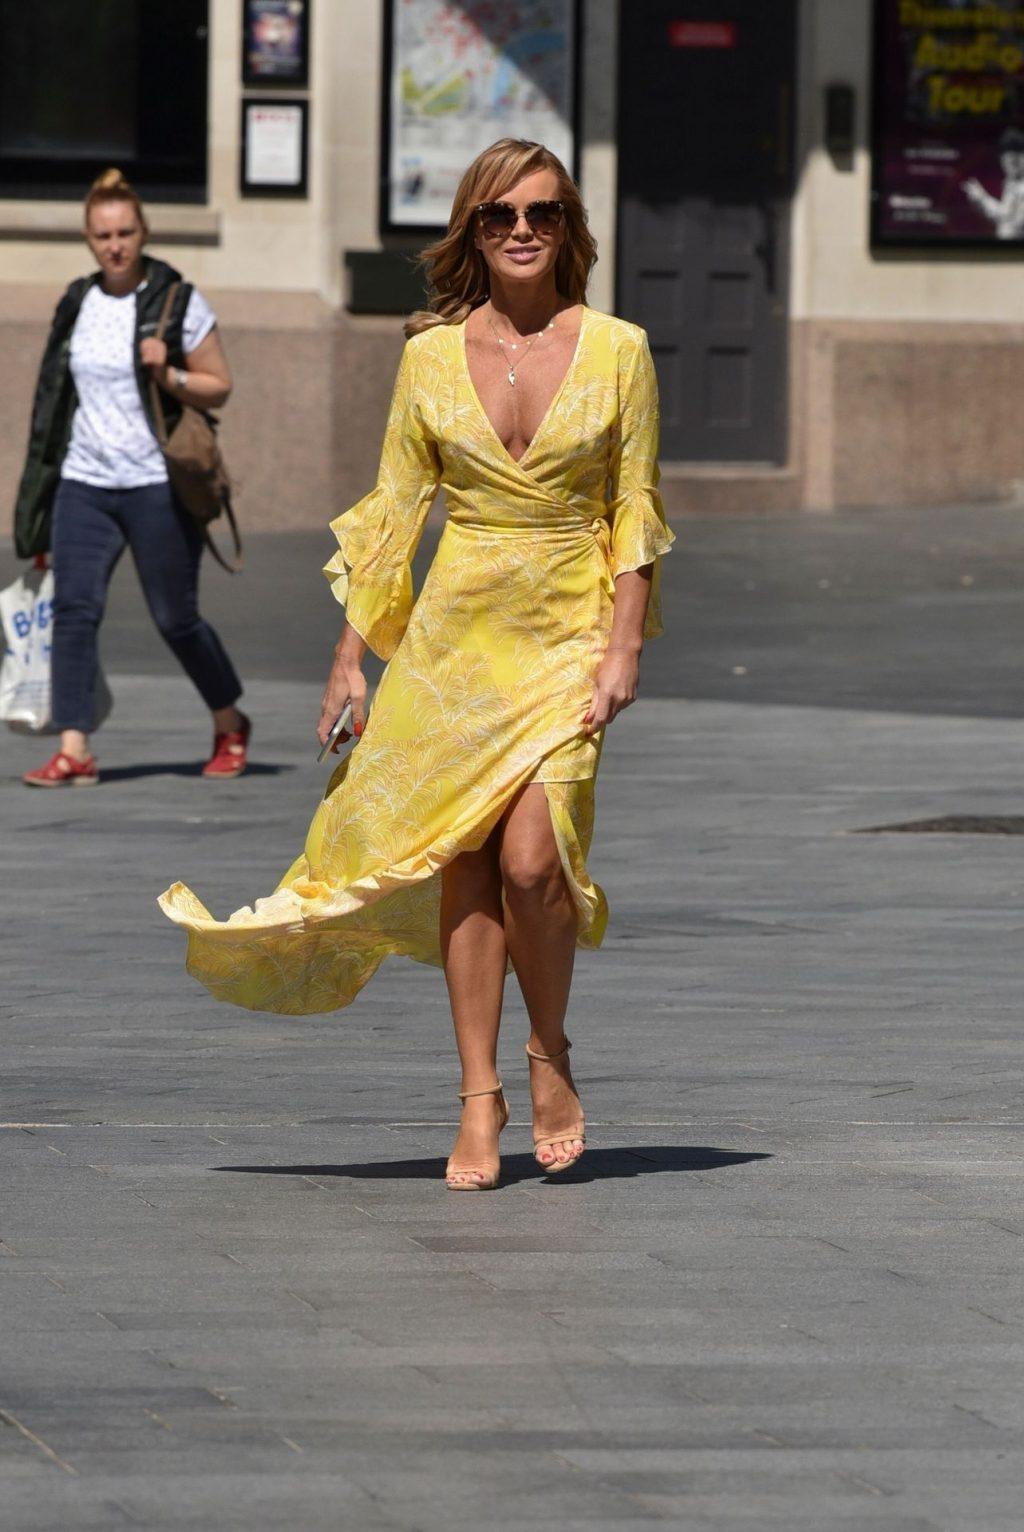 Amanda Holden Displays Her Pokies in a Yellow Dress (67 Photos)